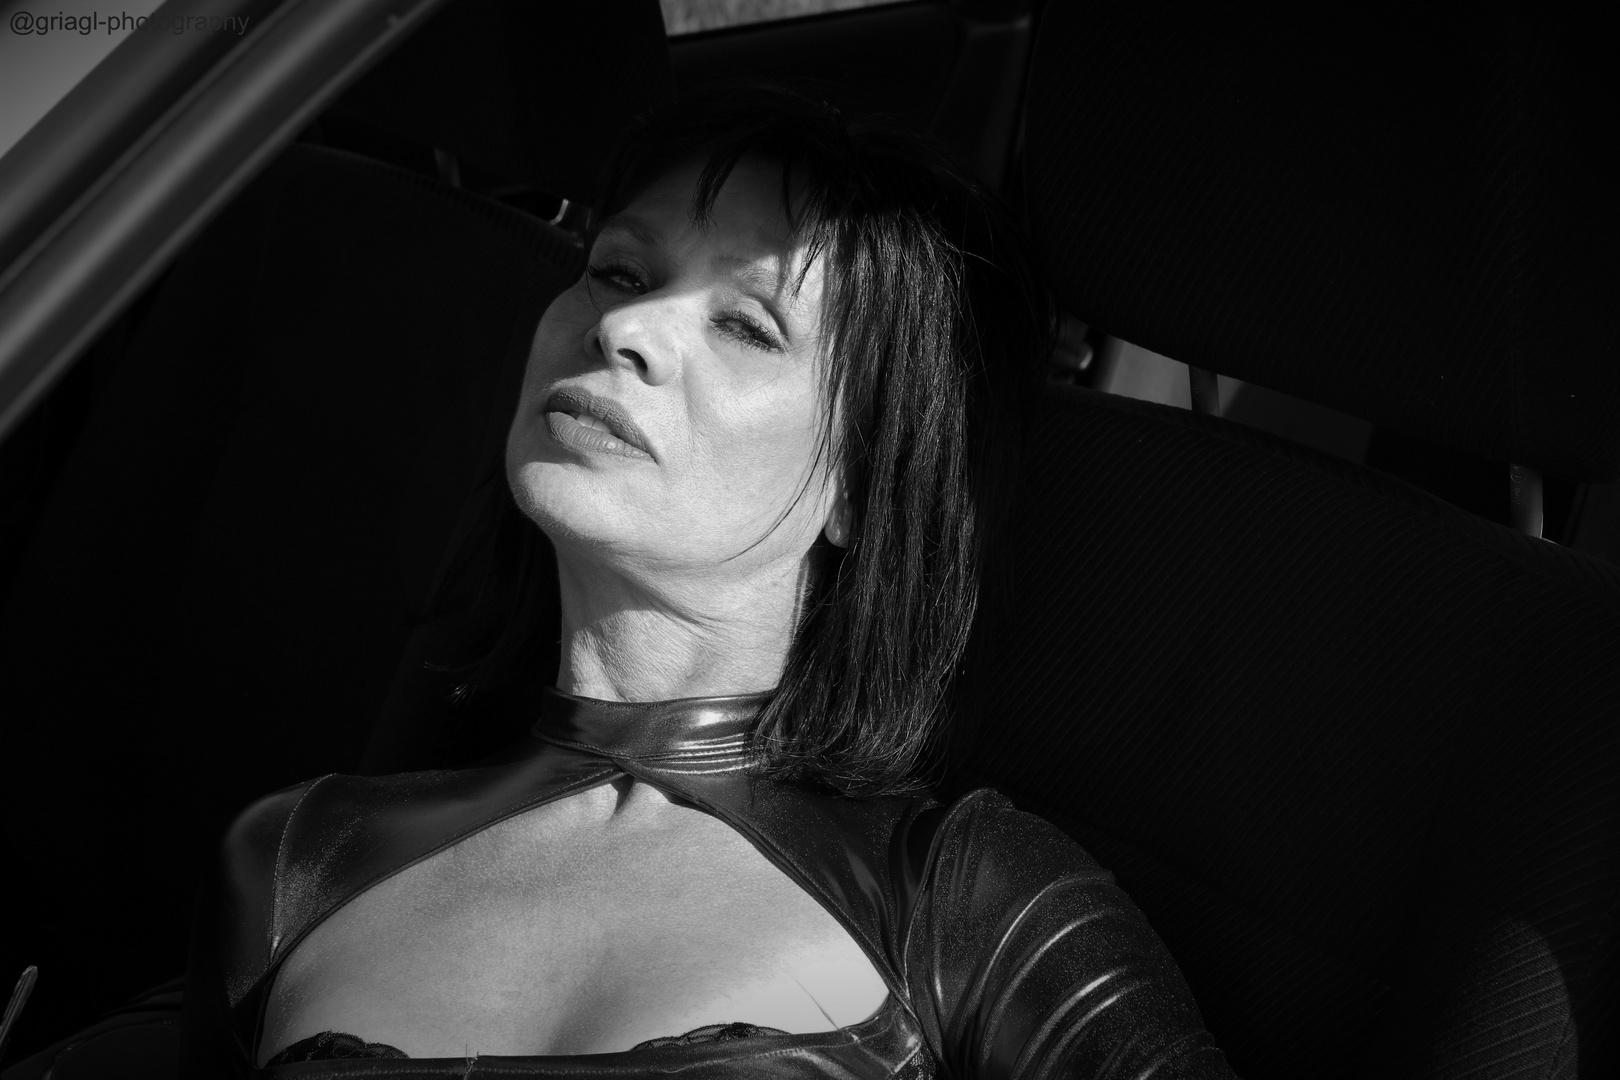 Maureen on my car iV